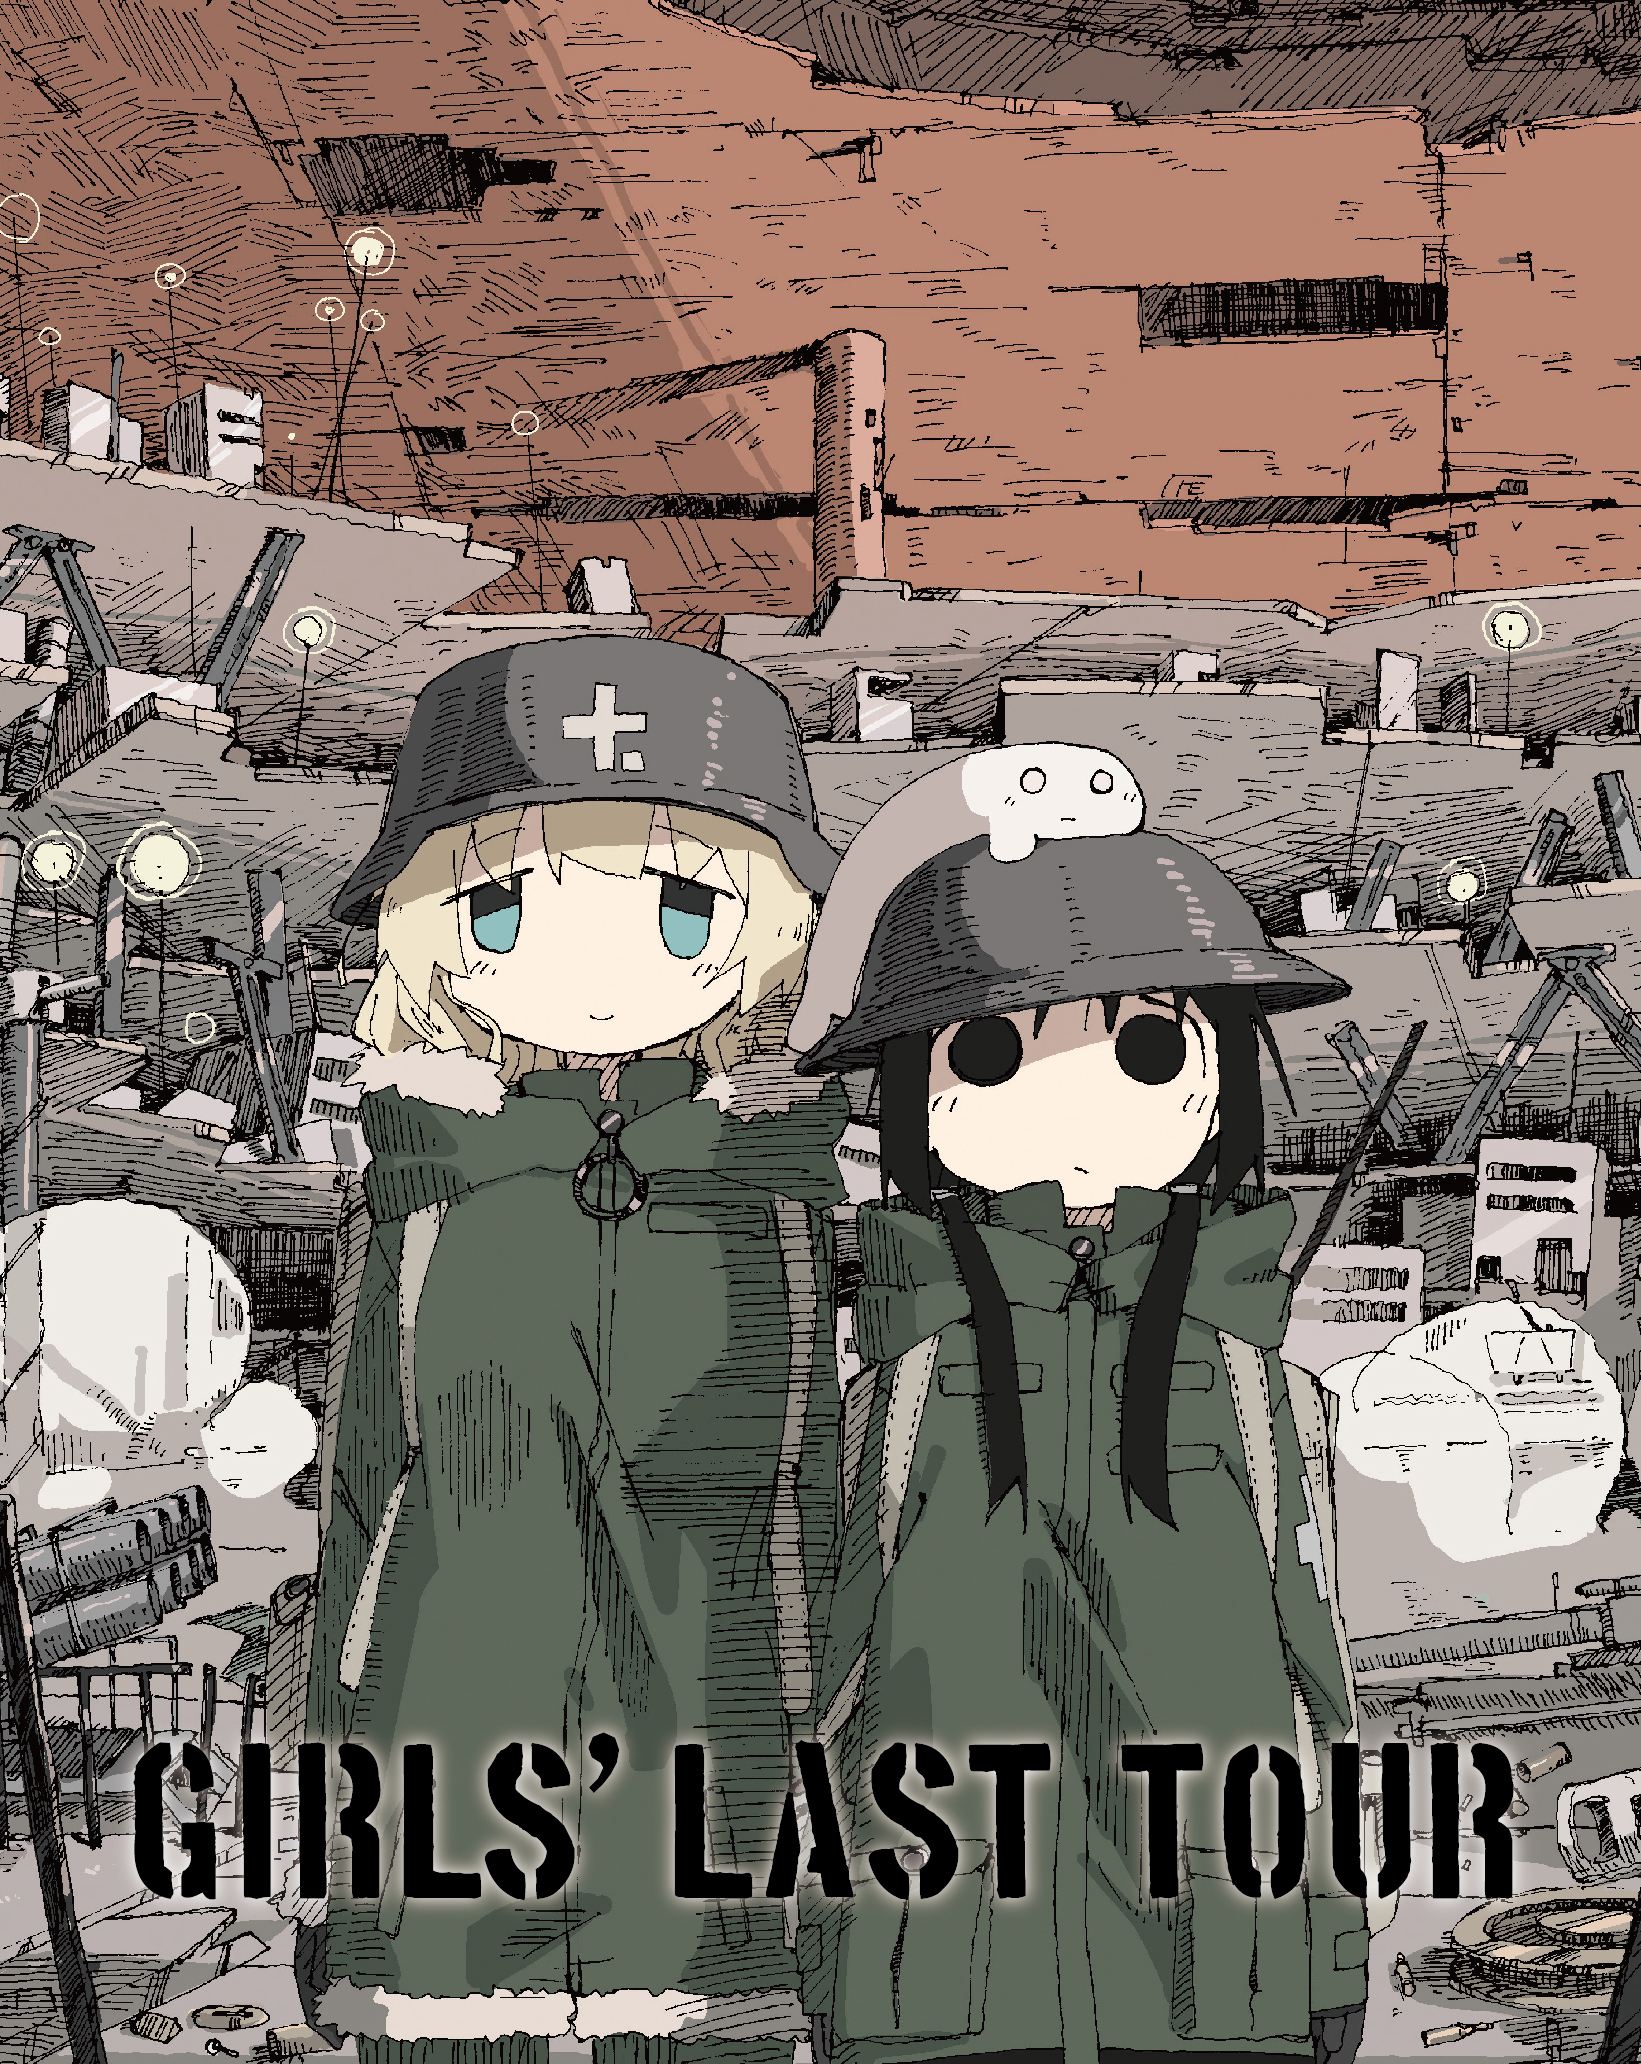 TVアニメ『少女終末旅行』Blu-ray&DVD第3巻のジャケットが公開! 原作者・つくみず先生による立ち姿のチトとユーリが目印